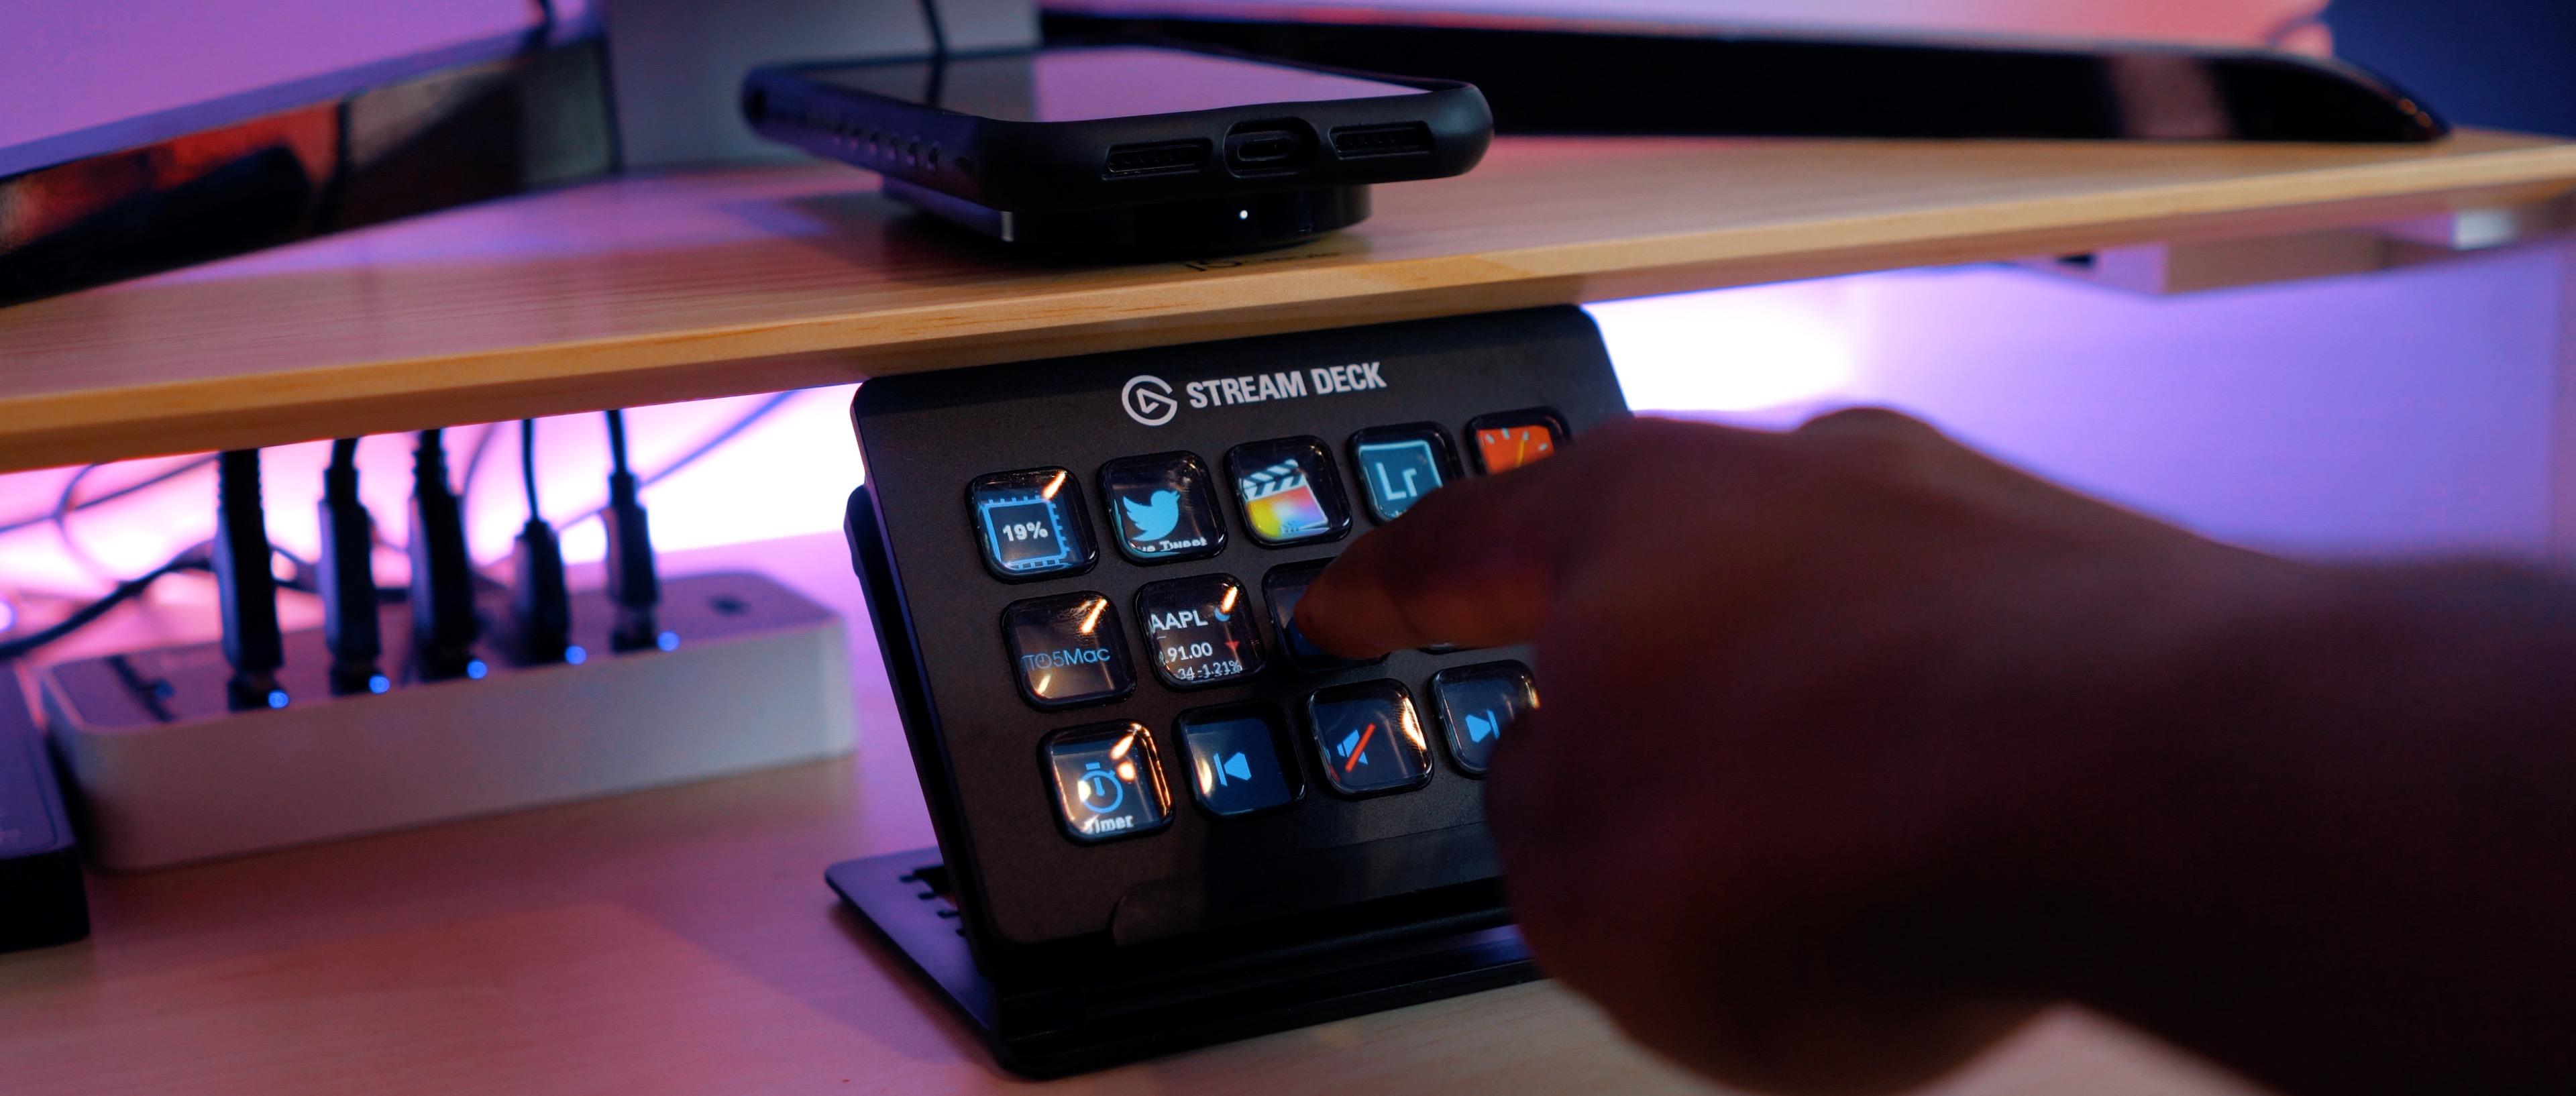 Hands On Elgato Stream Deck Live Streaming Custom Controller Video